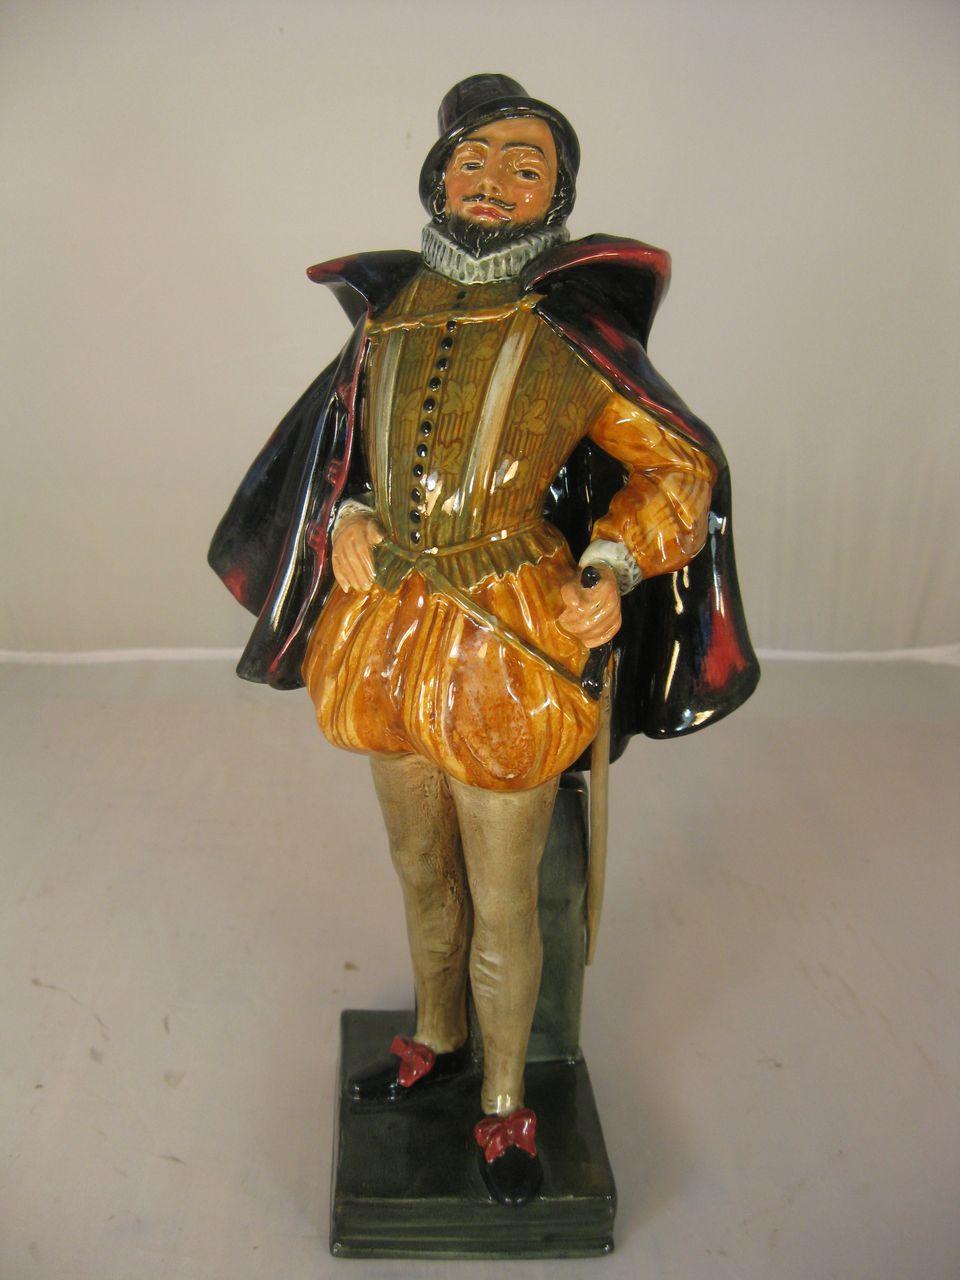 Royal Doulton Figures - Sir Walter Raleigh - HN1751